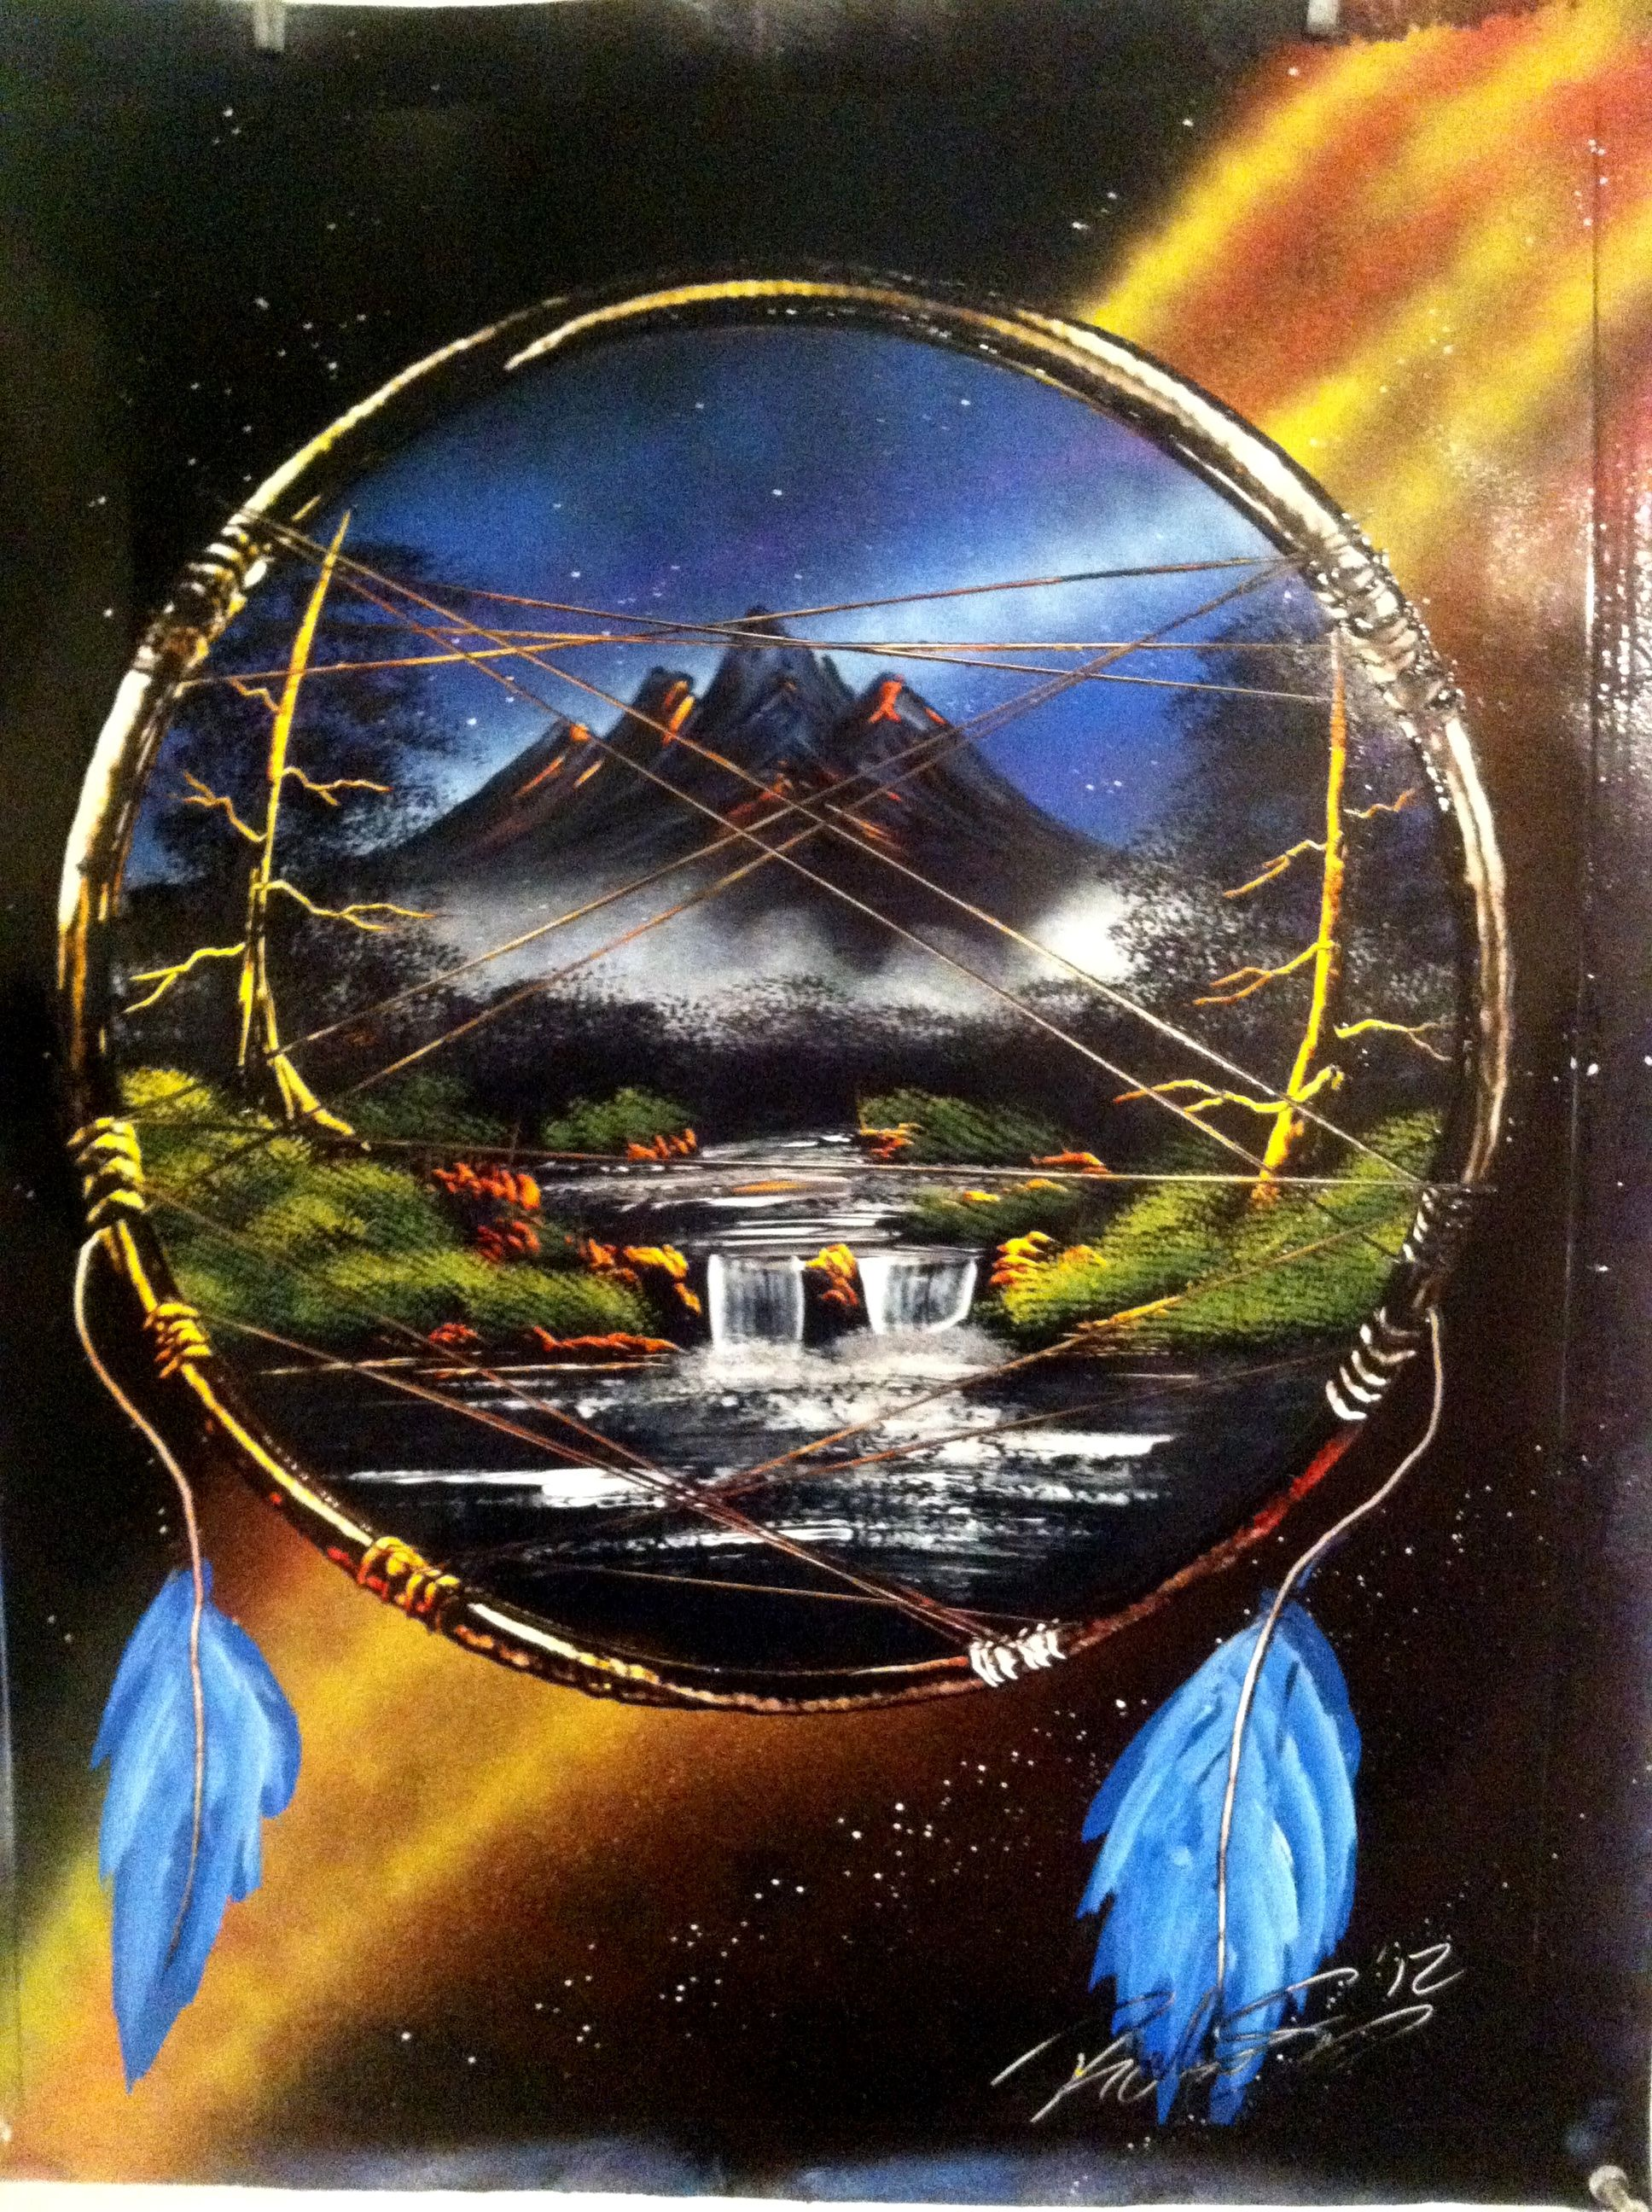 Mountain Nature Dreamcatcher Spray Painting Art